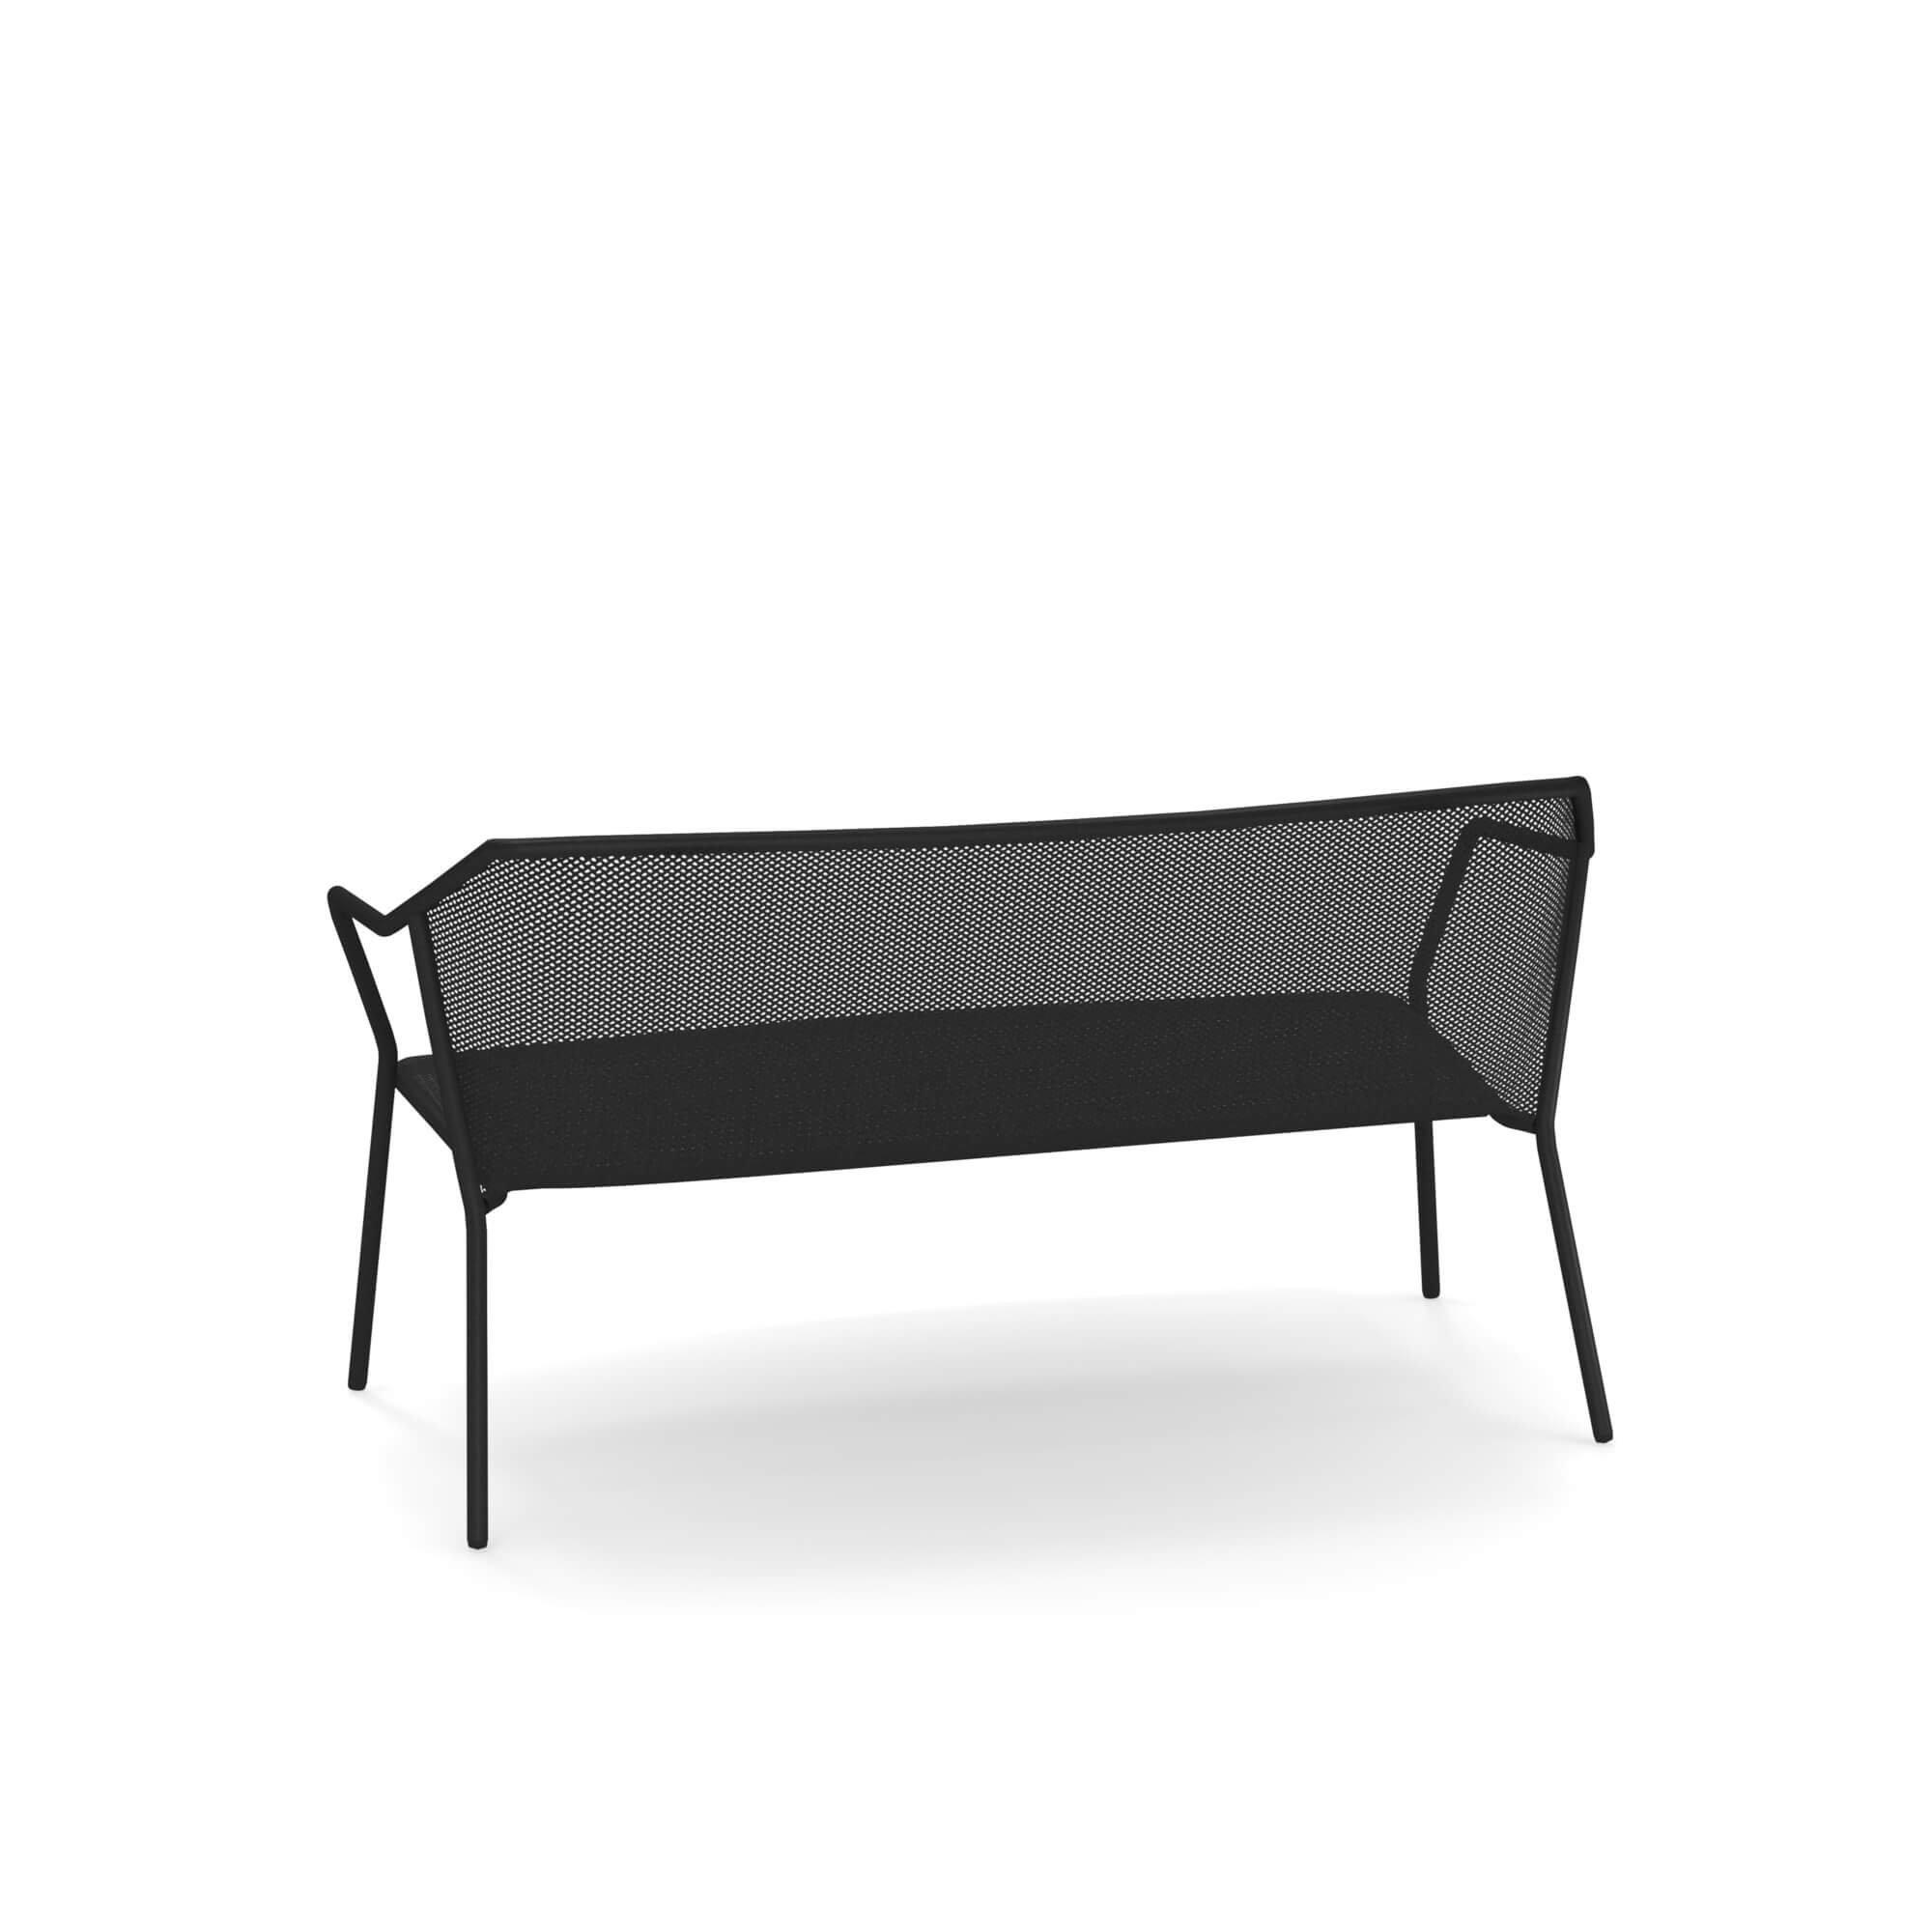 Darwin 527 sofa from Emu